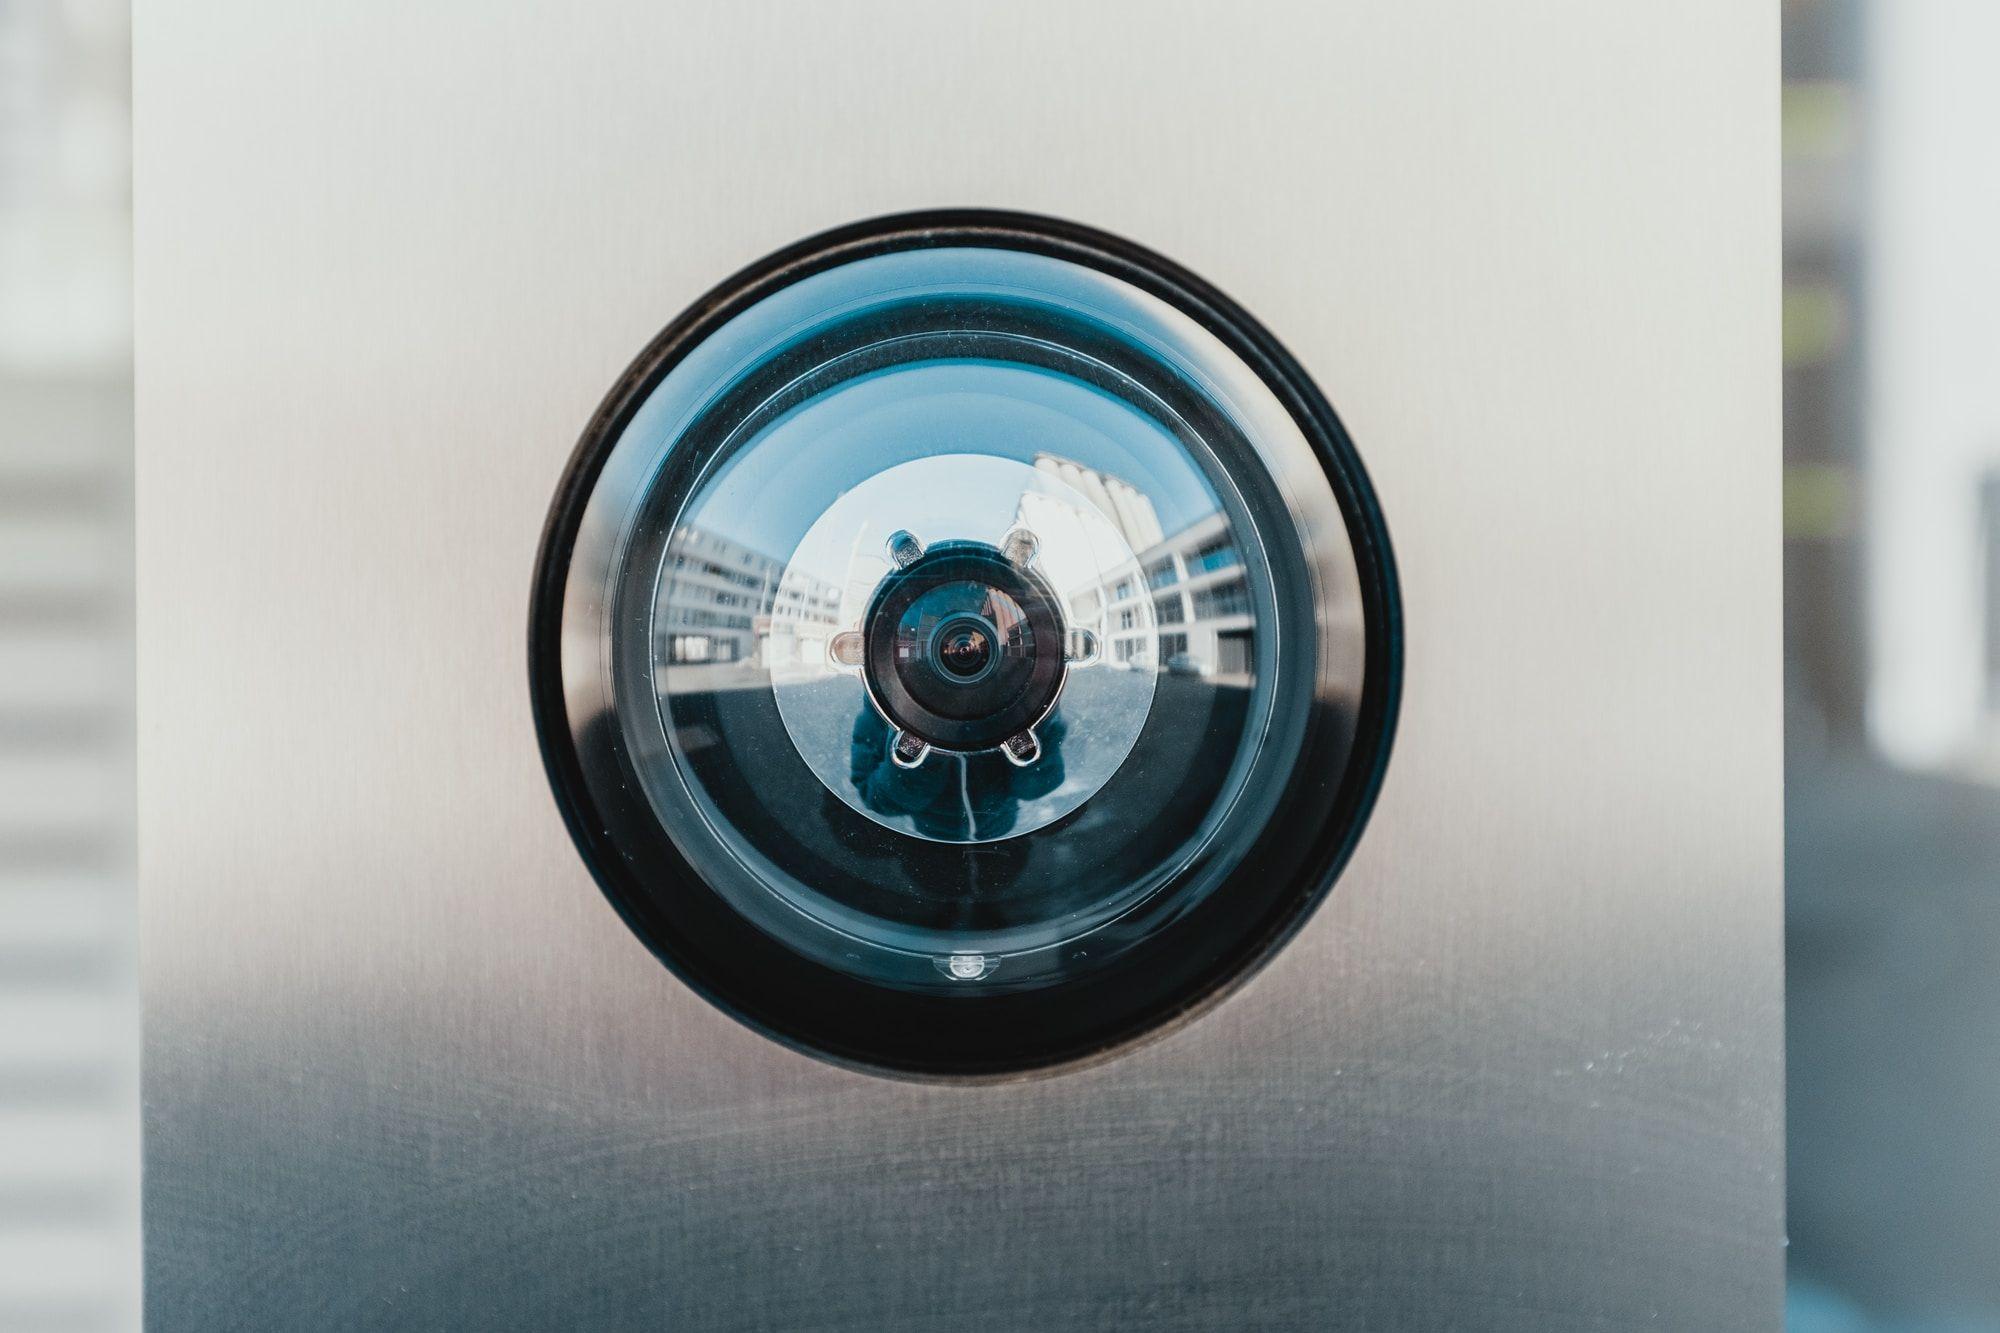 CCTV Surveillance Security Video Systems Australia